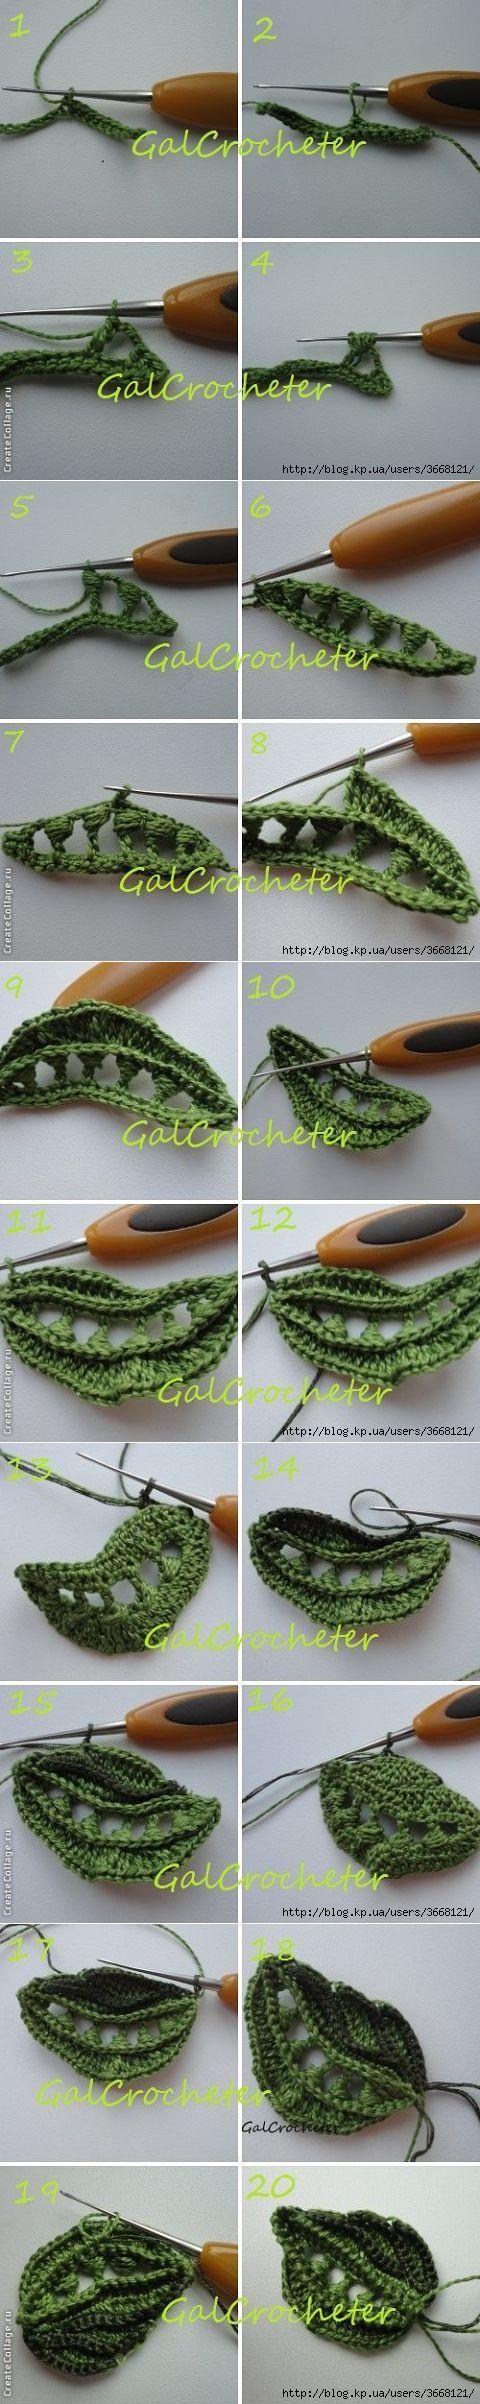 İrish crochet